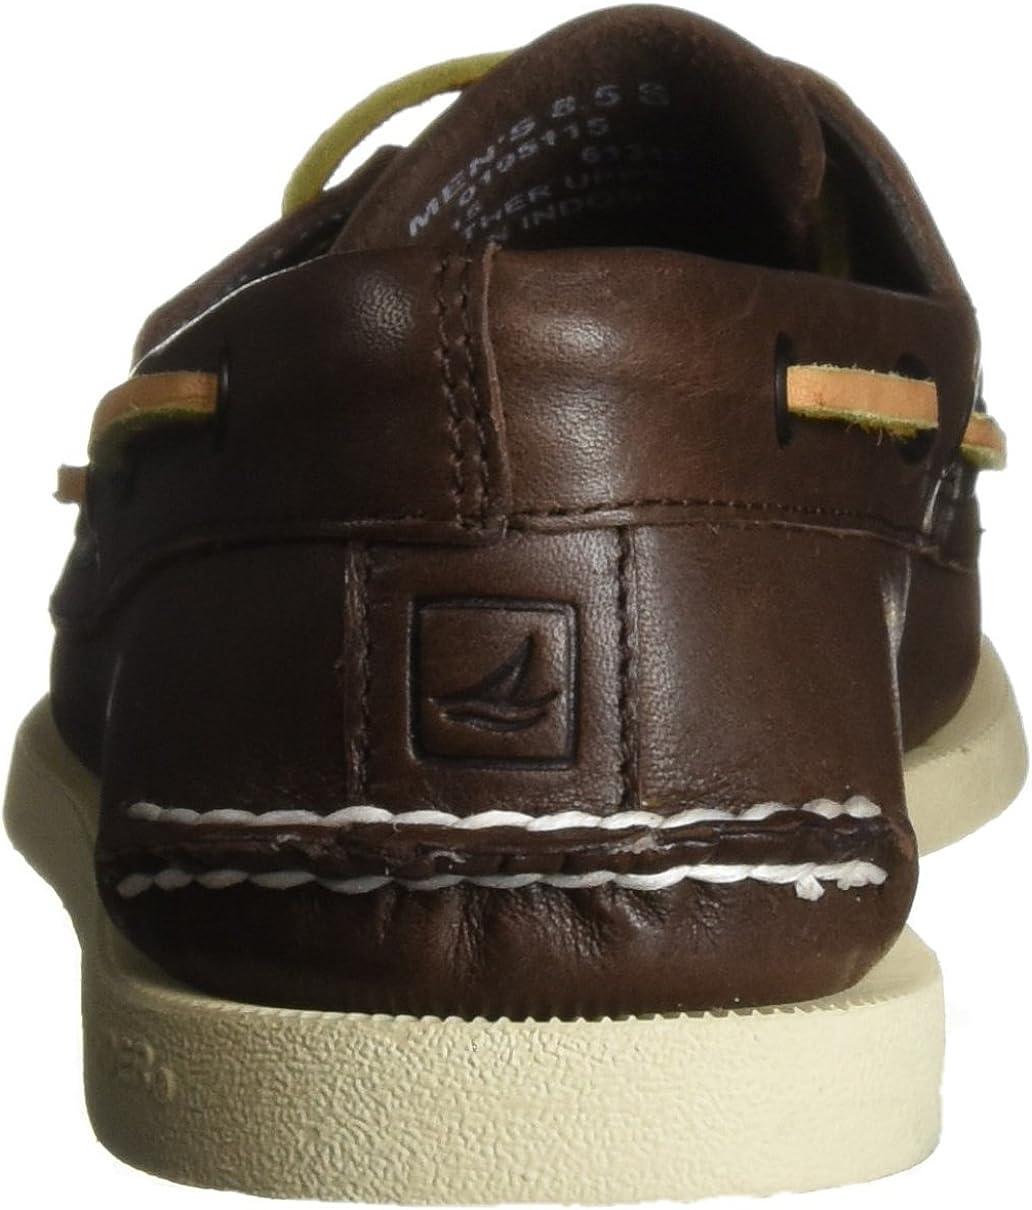 Sperry Mens Authentic Original 2-Eye Boat Shoe